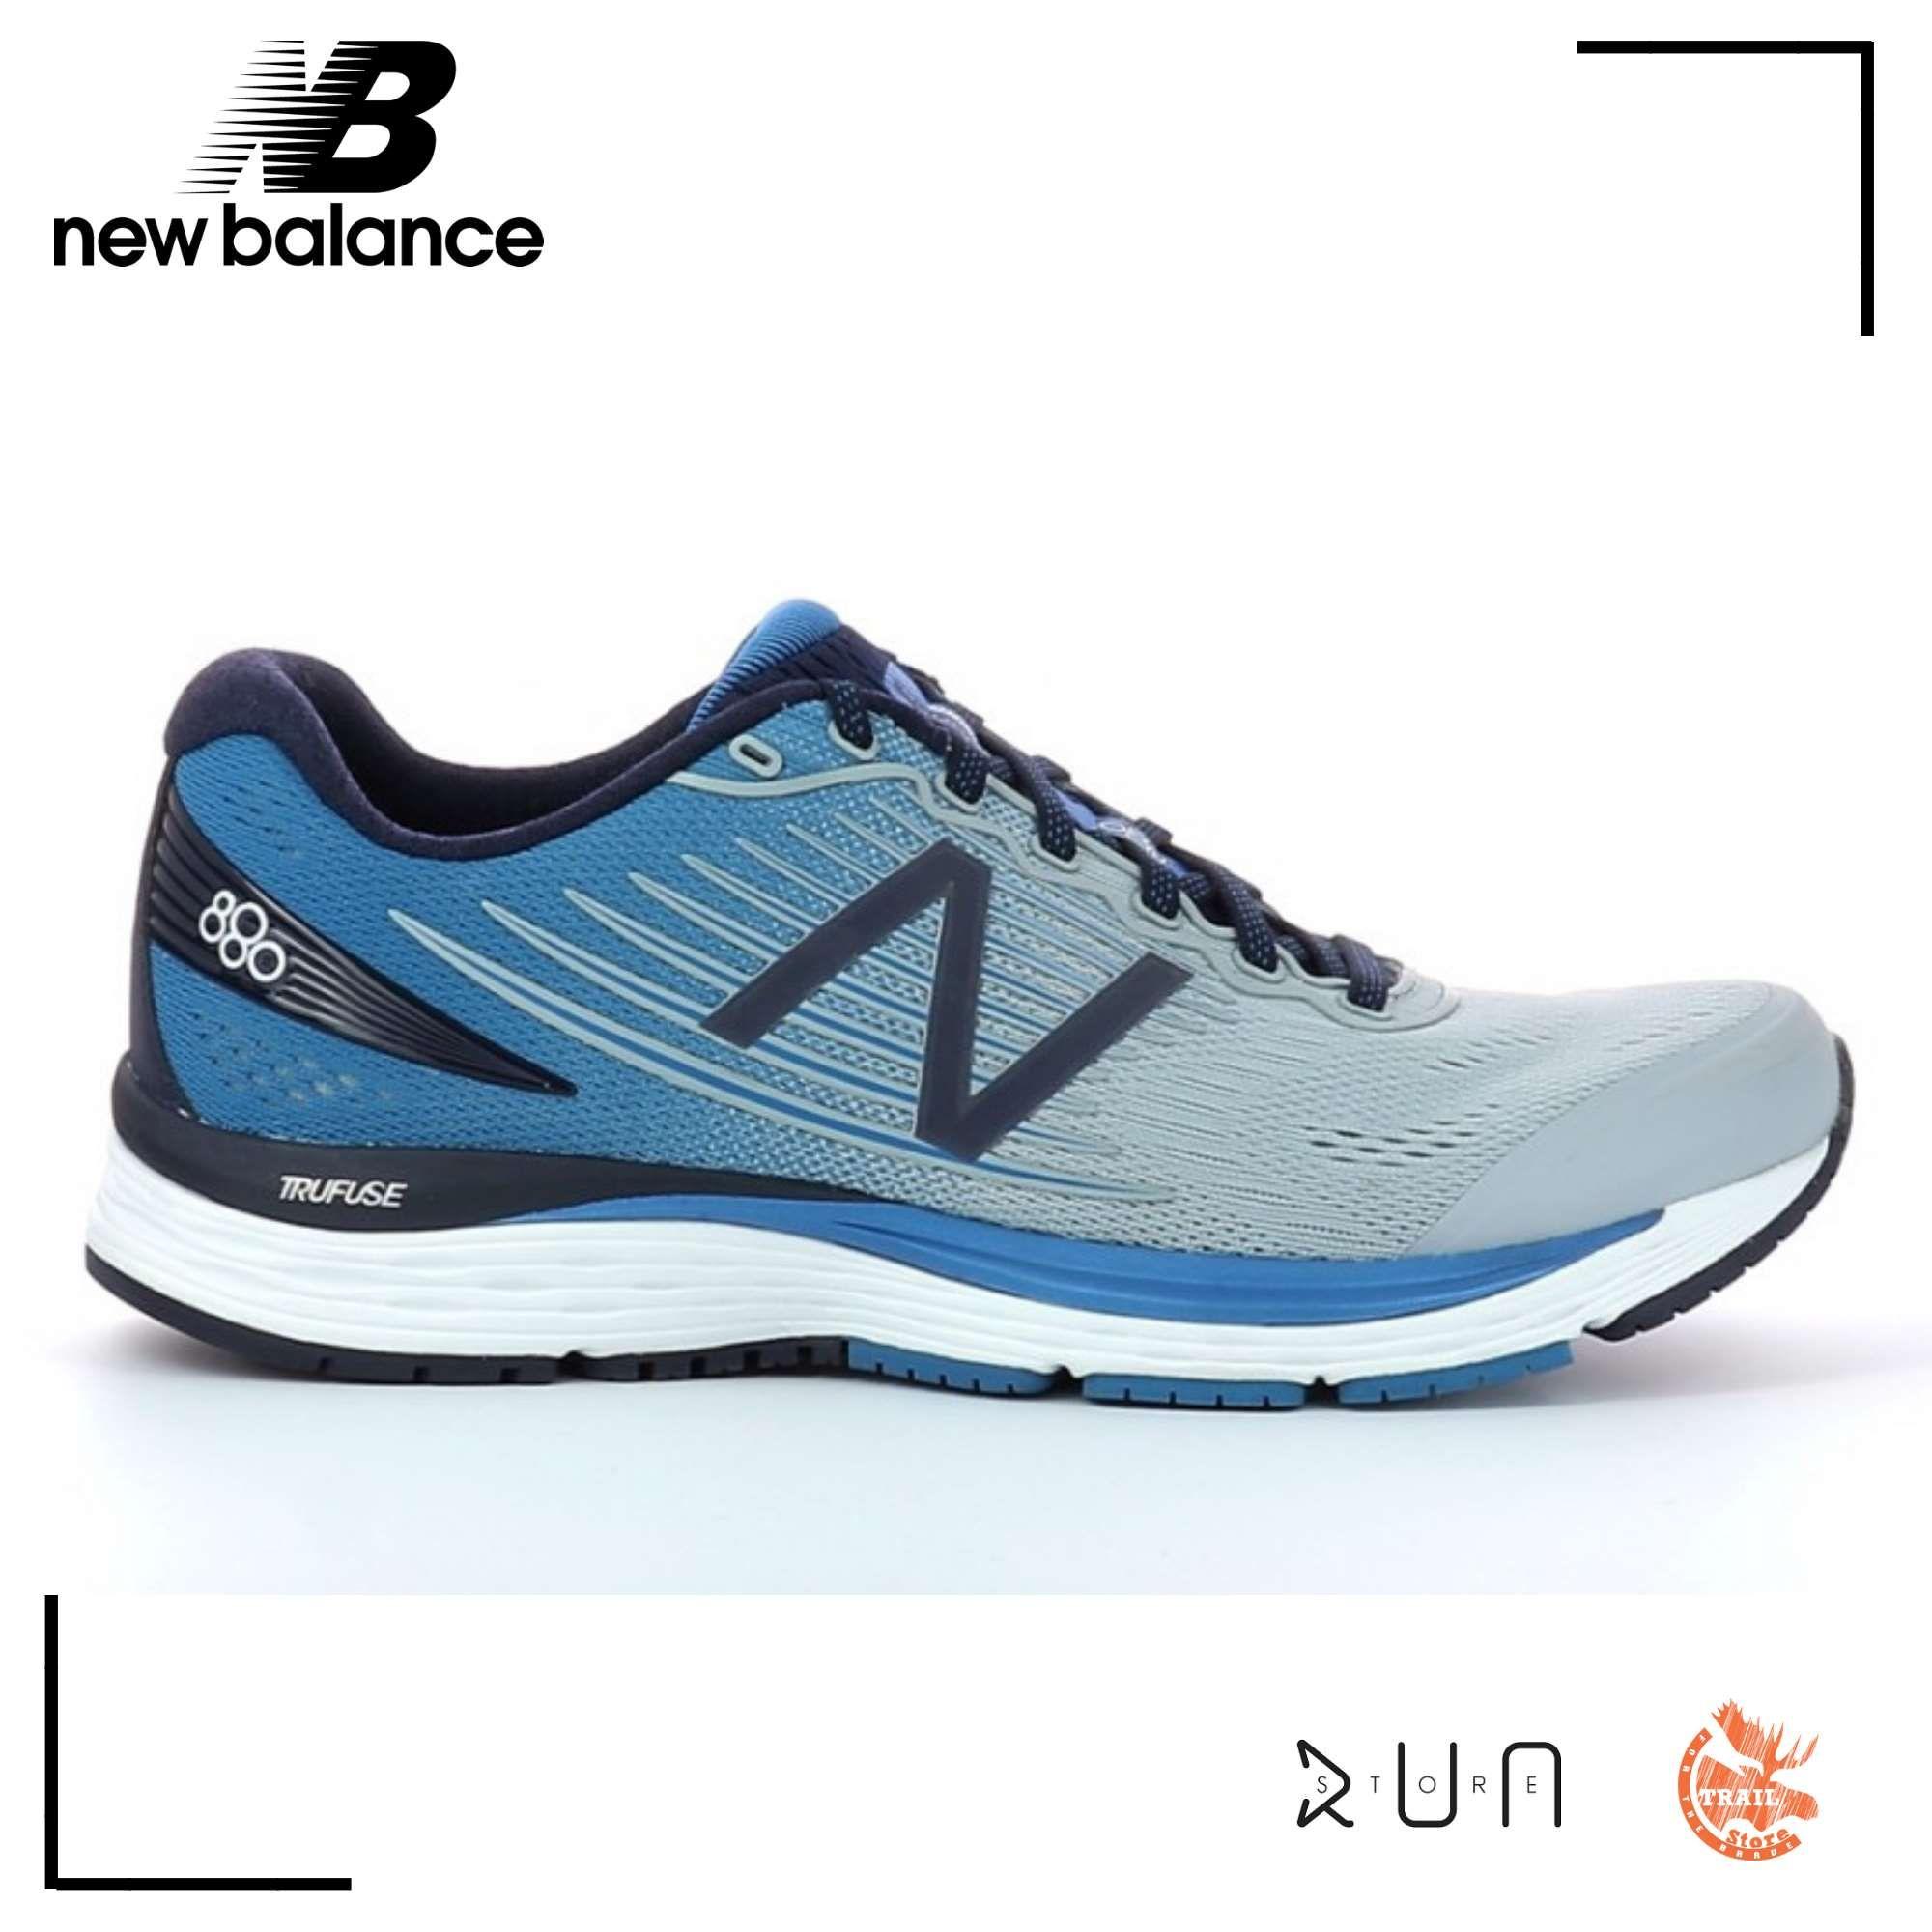 new balance m880 homme